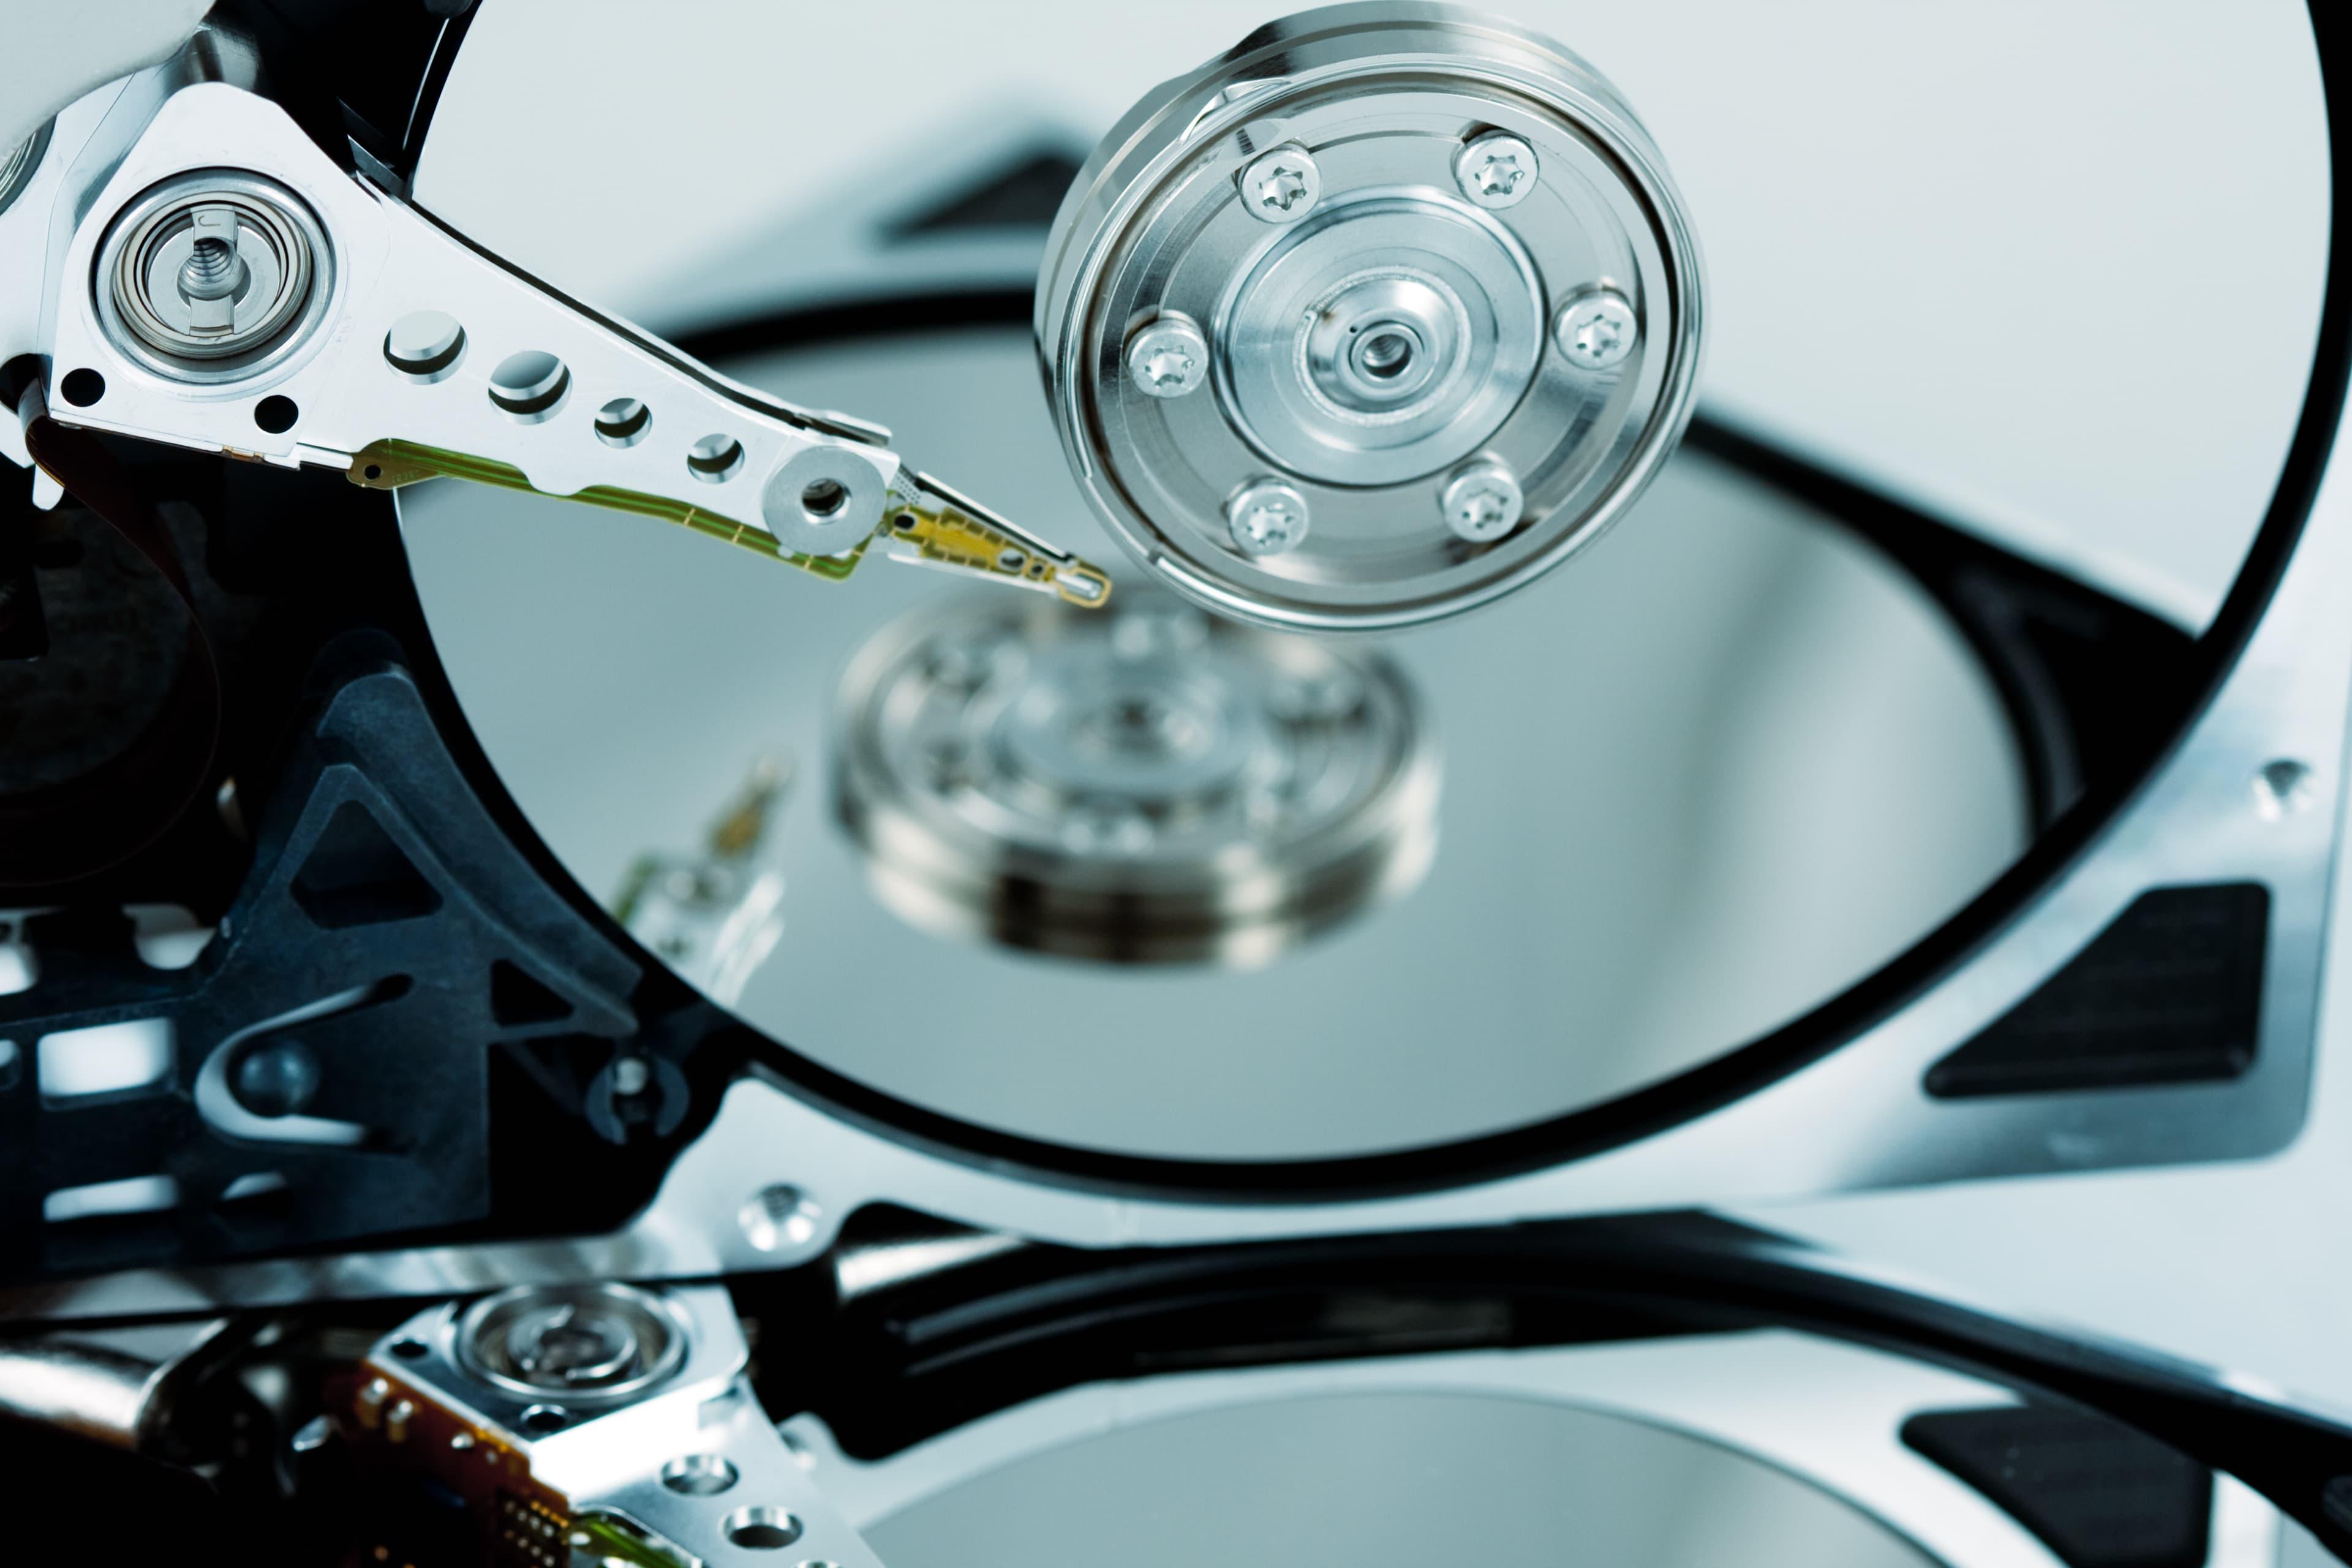 Testing VMware vSAN 6 6 1 on VMware Workstation 14 - Xtravirt